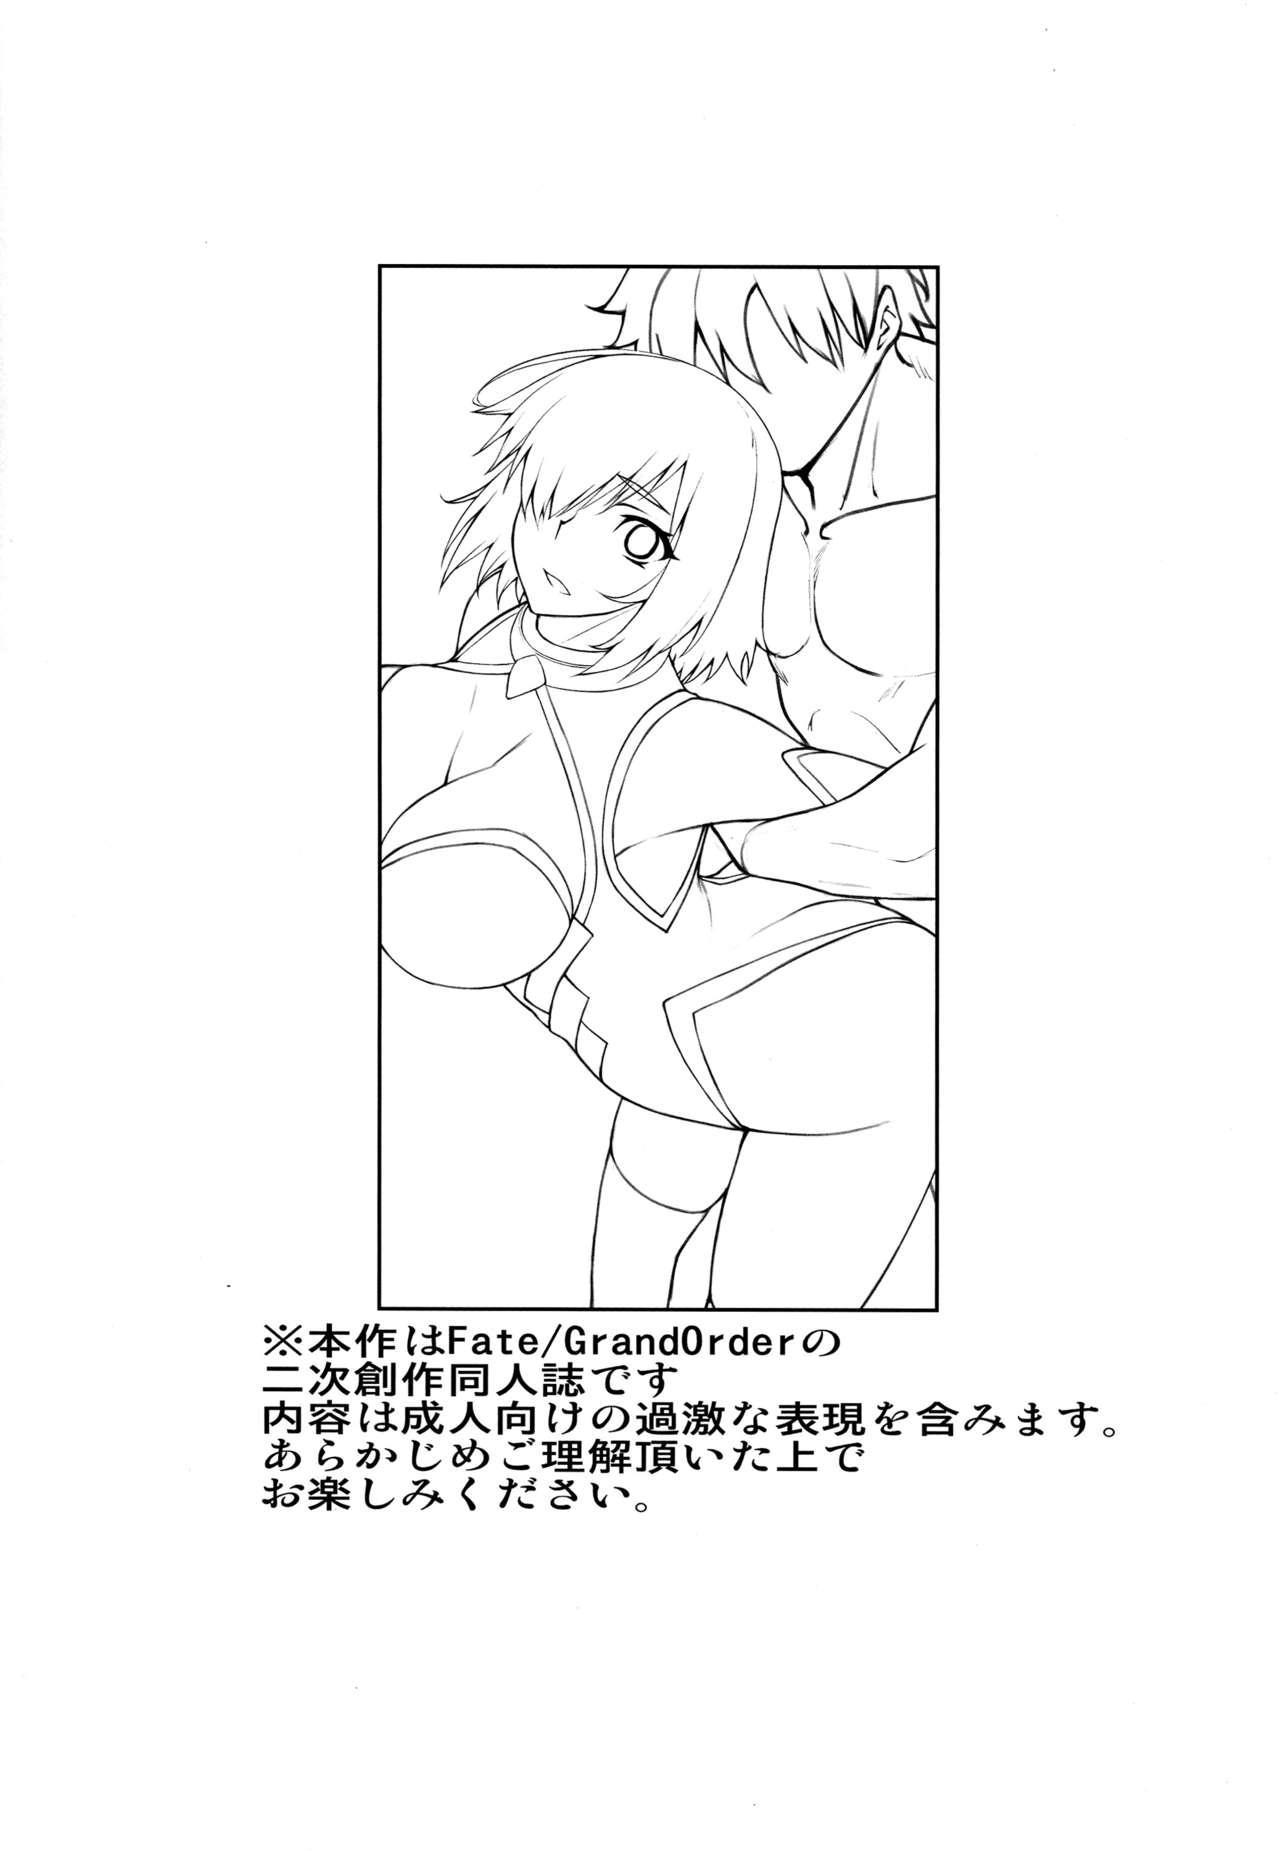 Yume yori Suteki na WonderLand 1